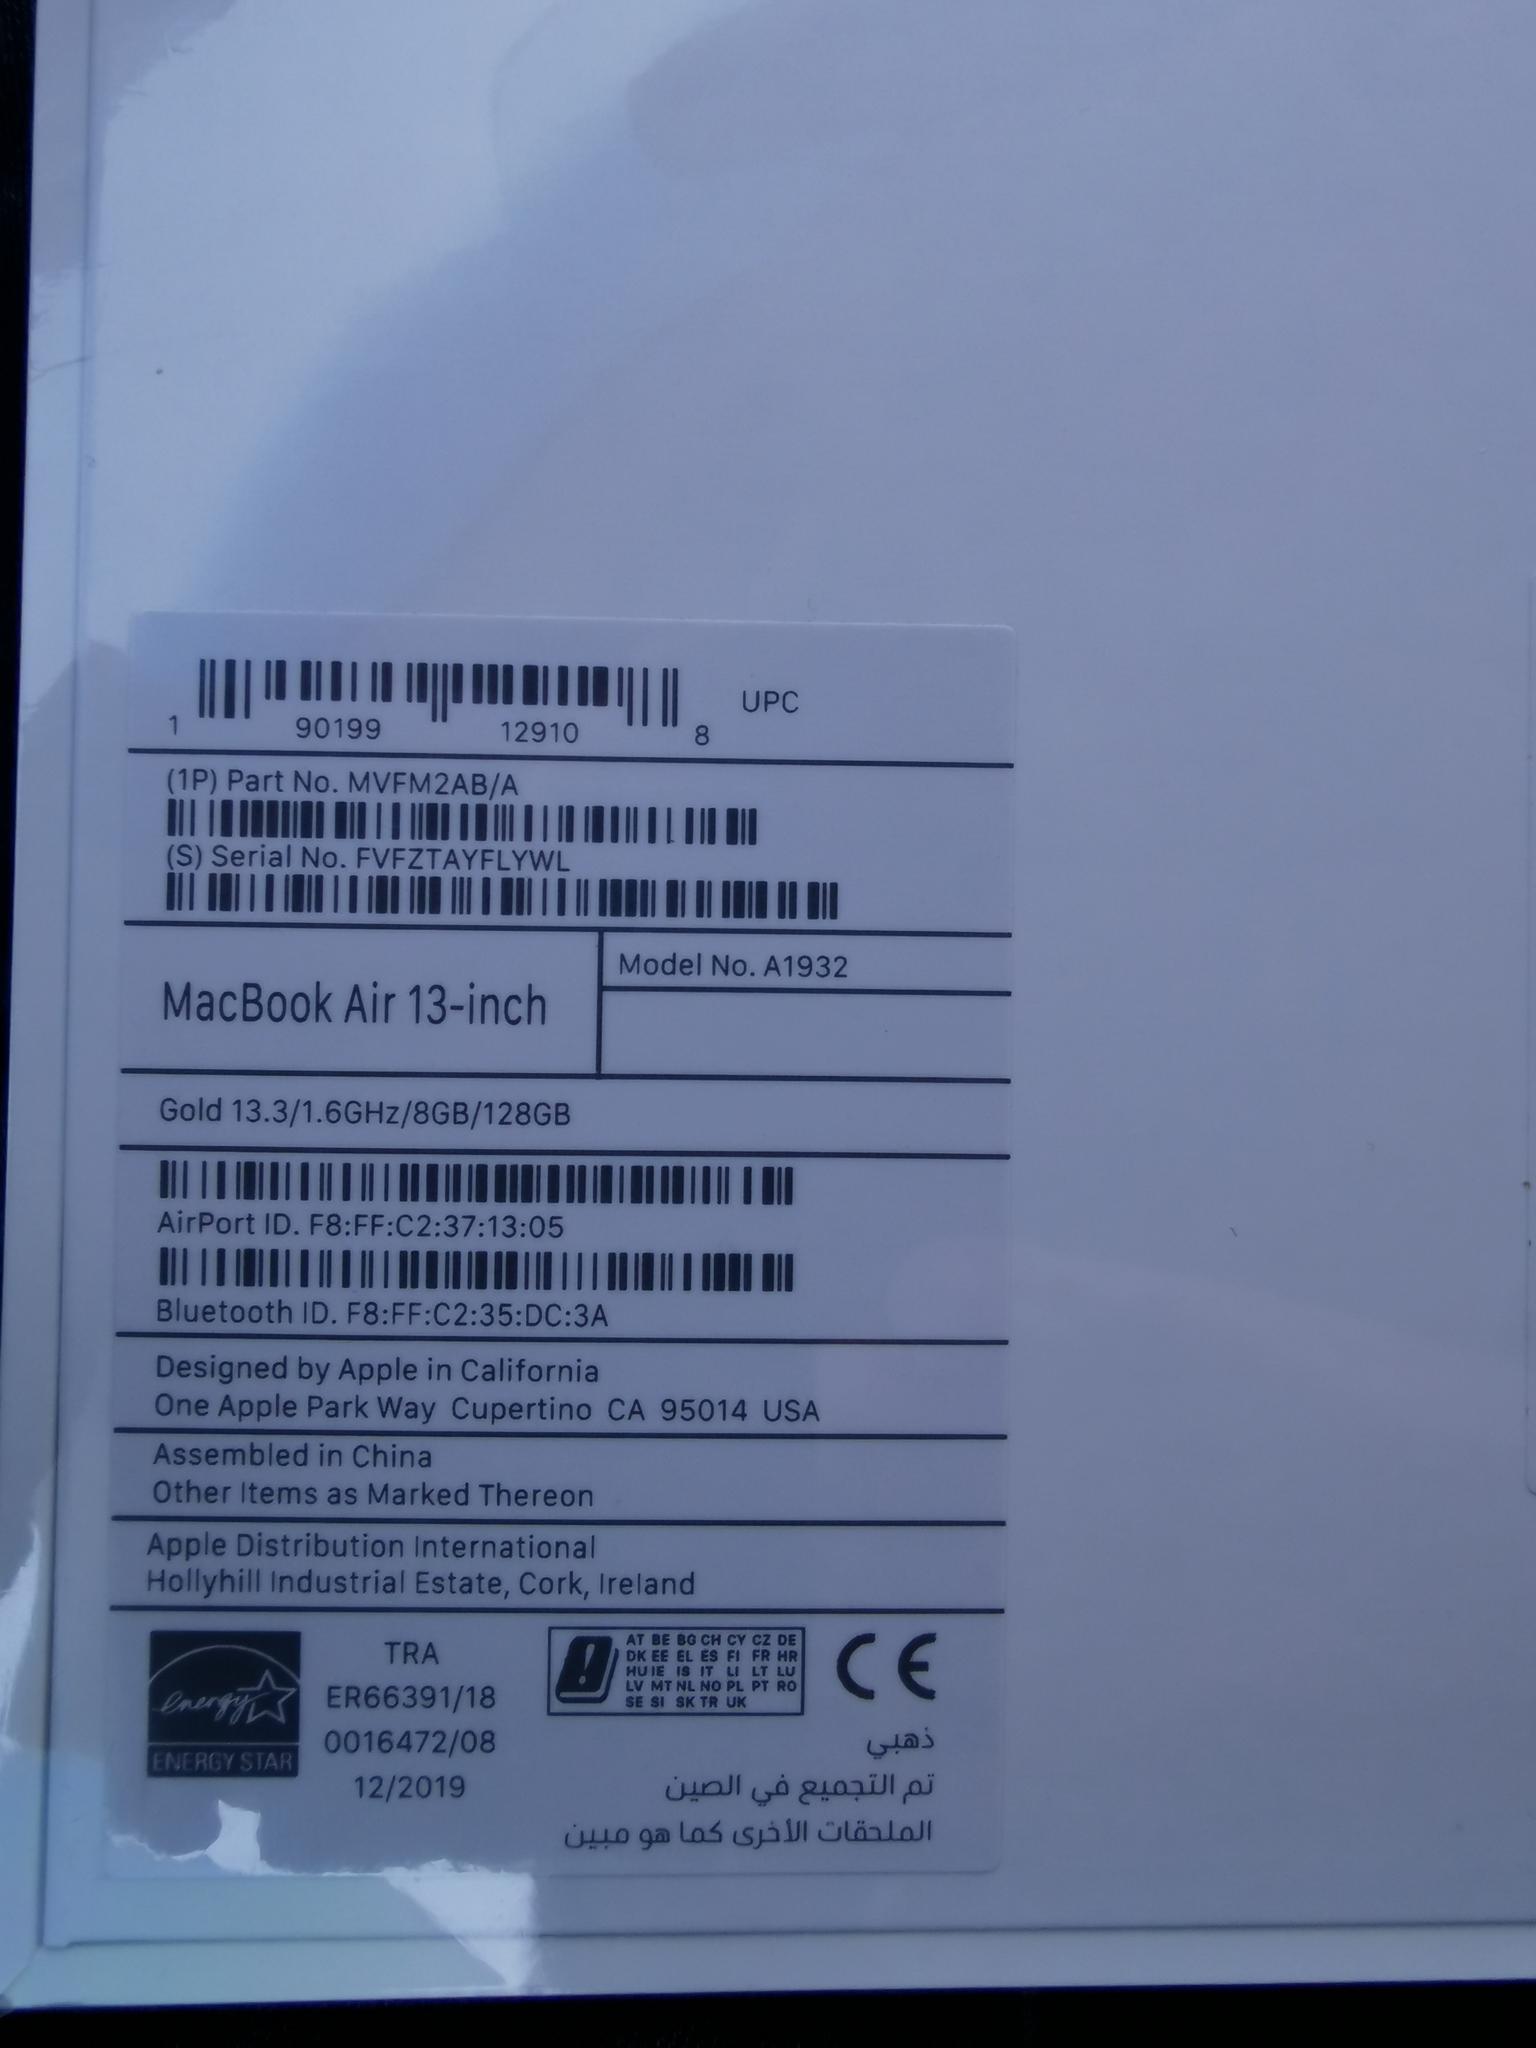 Brand new Apple MacBook Air (13-inch) dual-core In